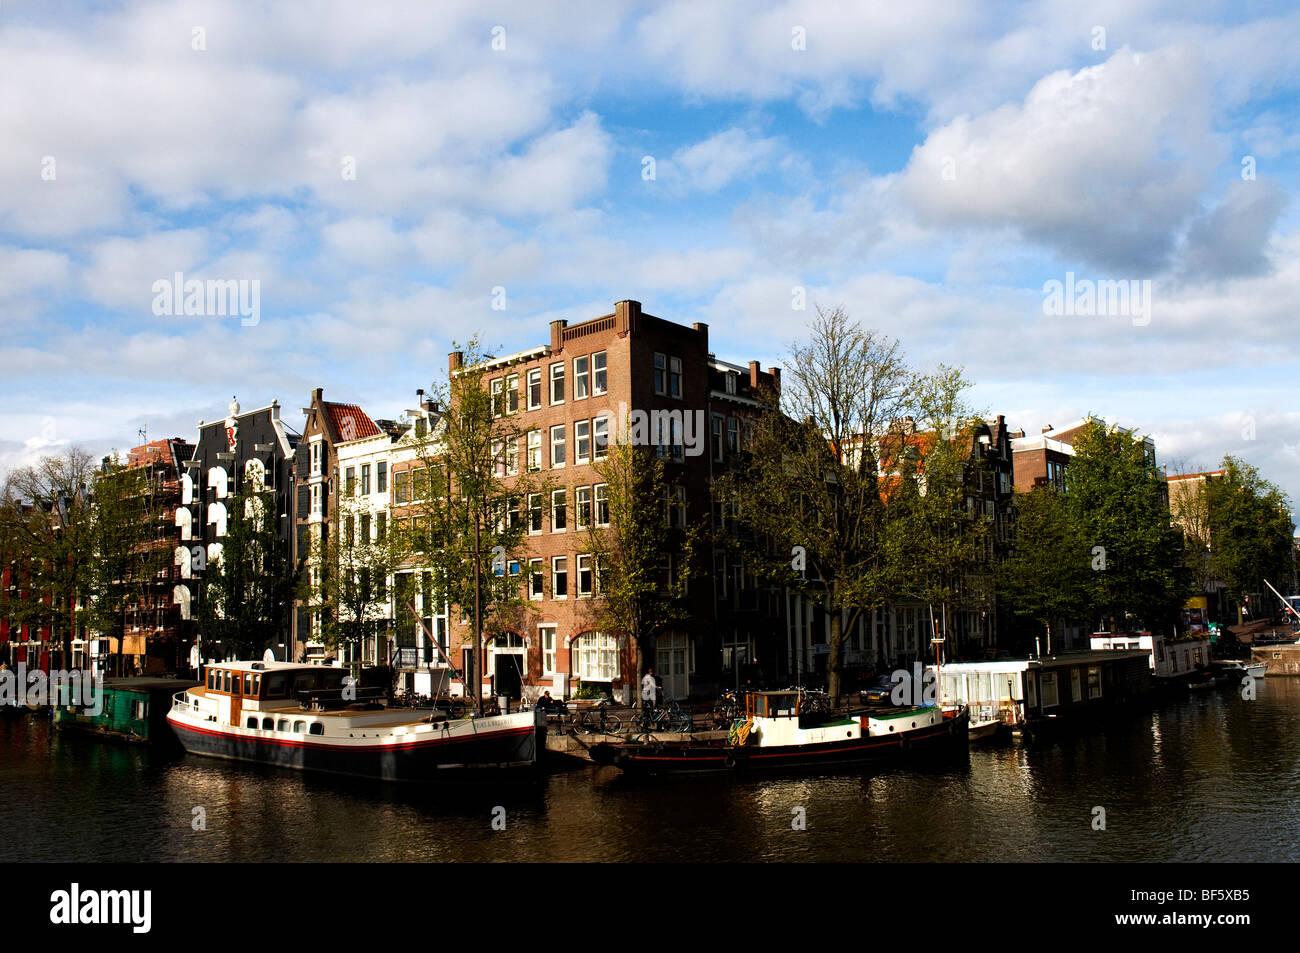 Corner of Prinsengracht and Brouwersgracht, Amsterdam, Holland, Netherlands - Stock Image